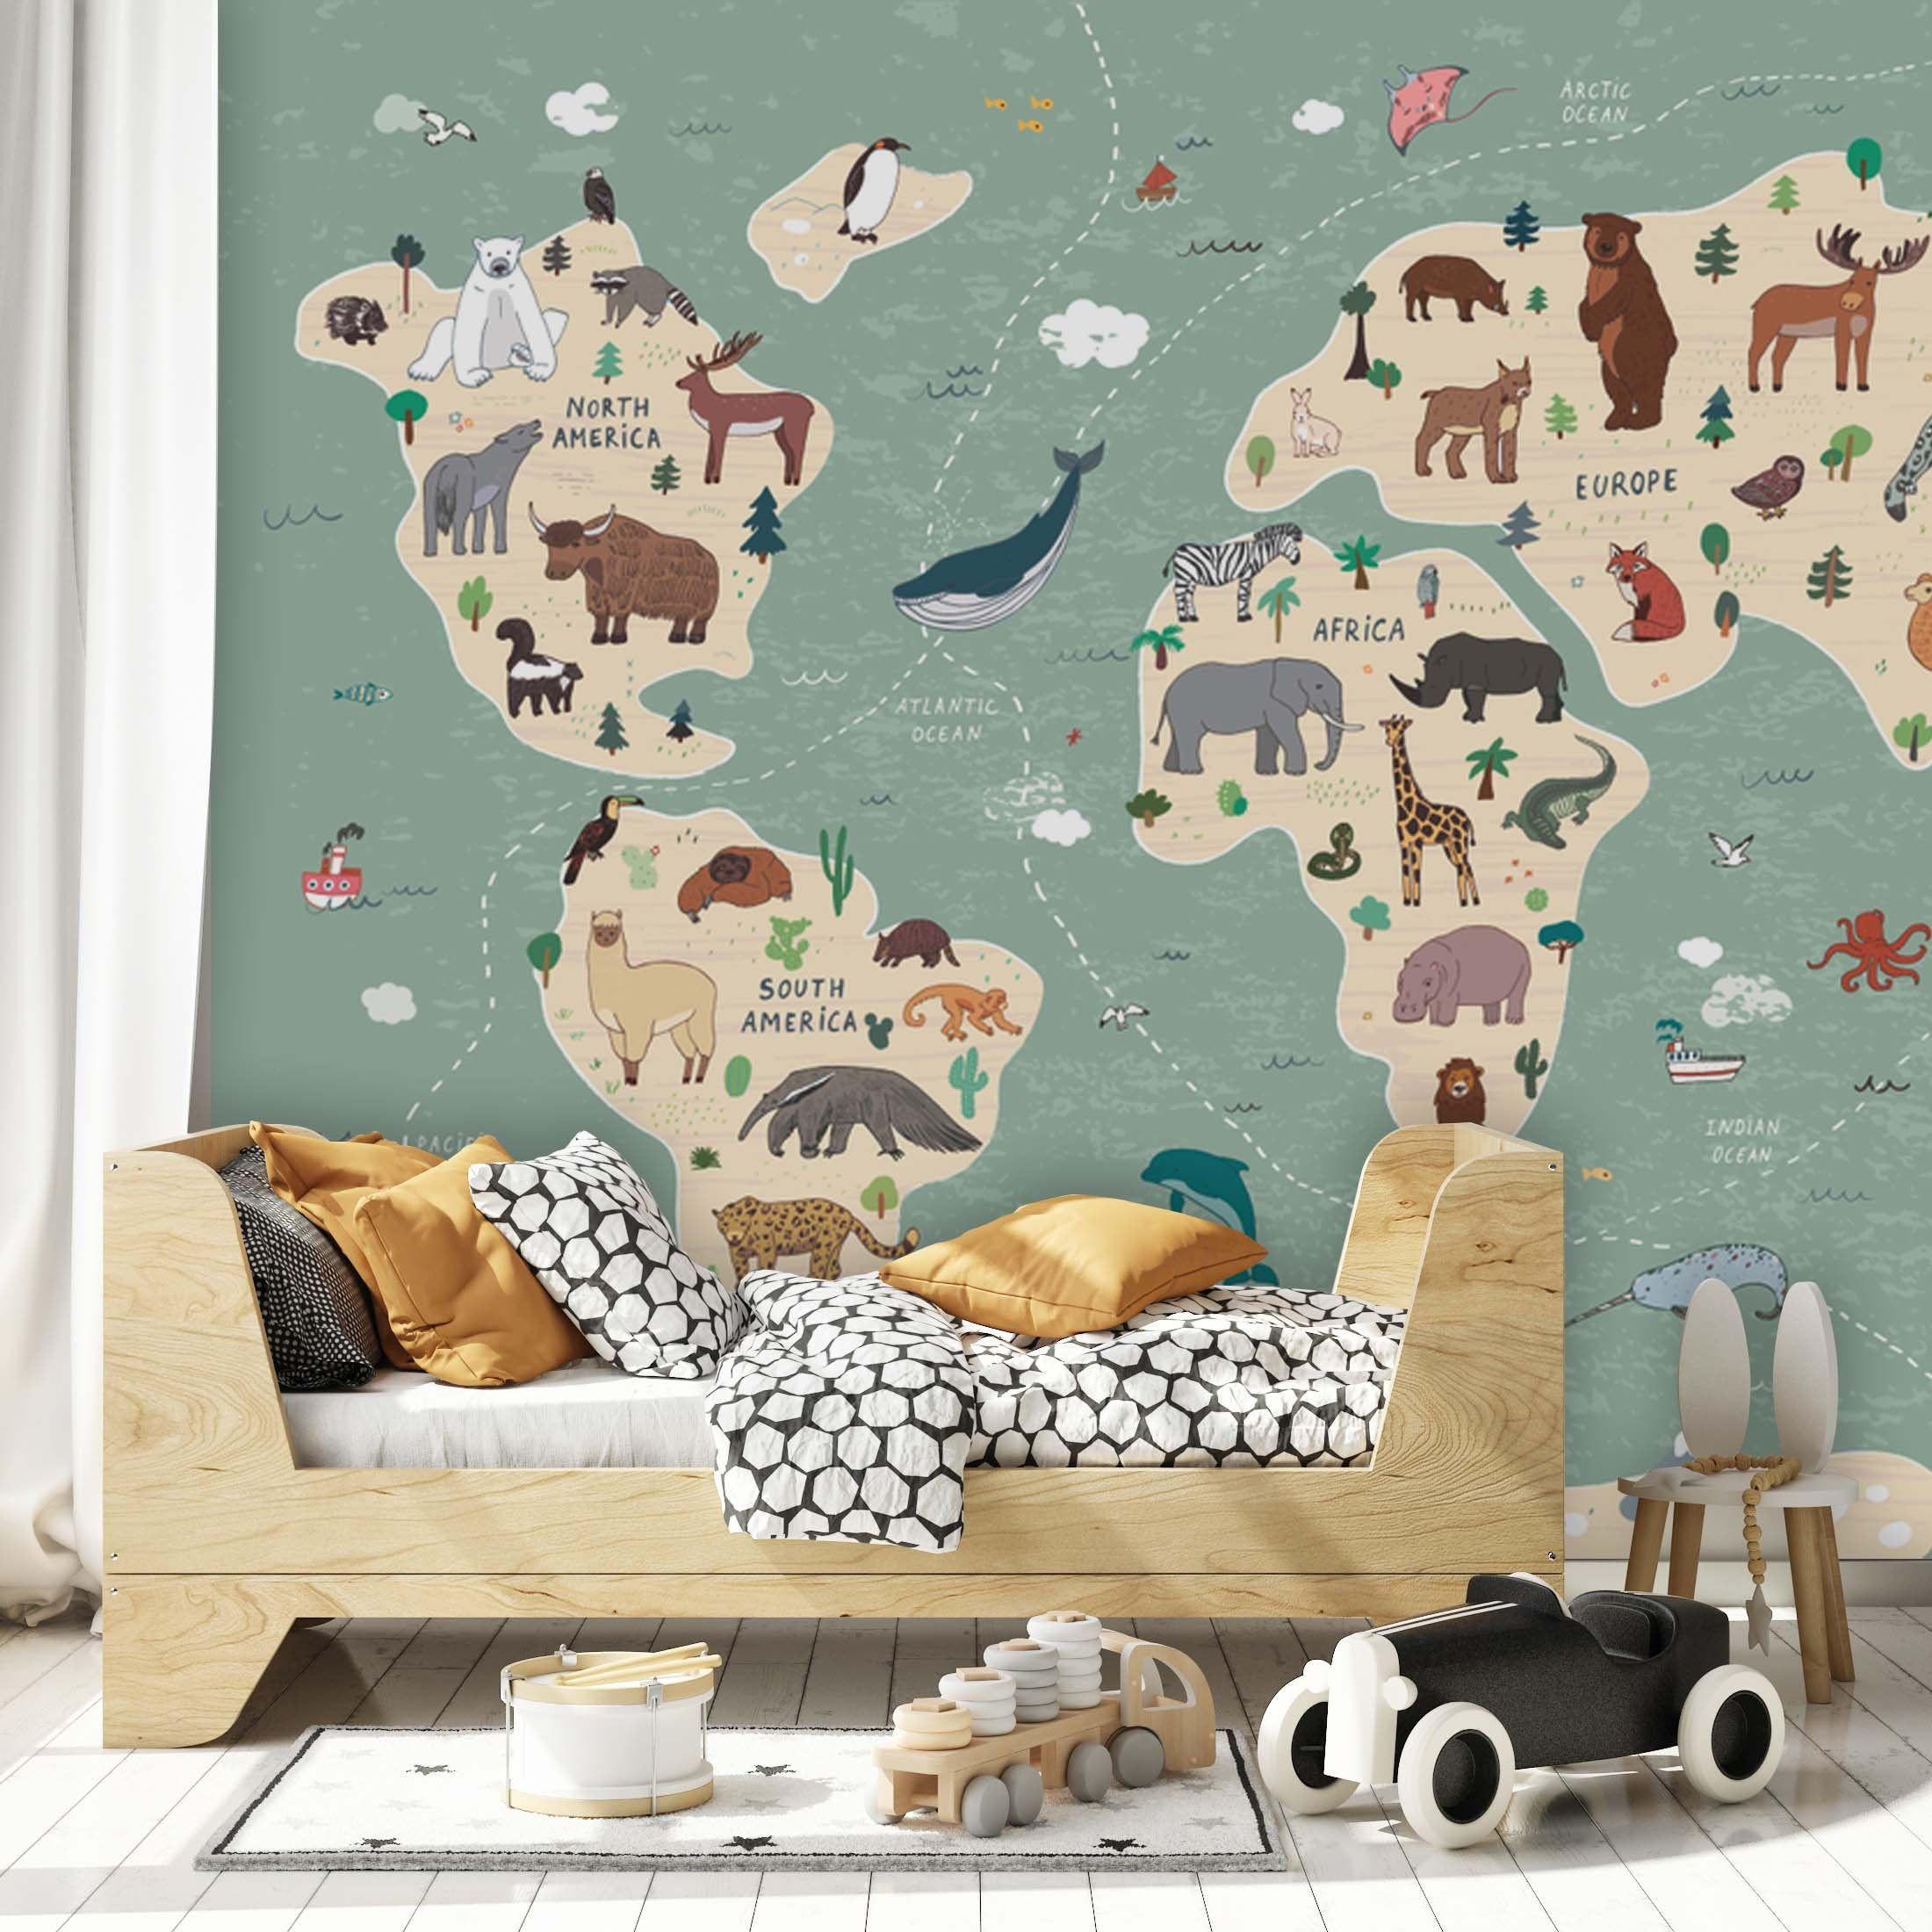 Children World Maps Animals And Plants Background Wallpaper Etsy Kids Room Murals Home Decor Wall Art Animal Bedroom